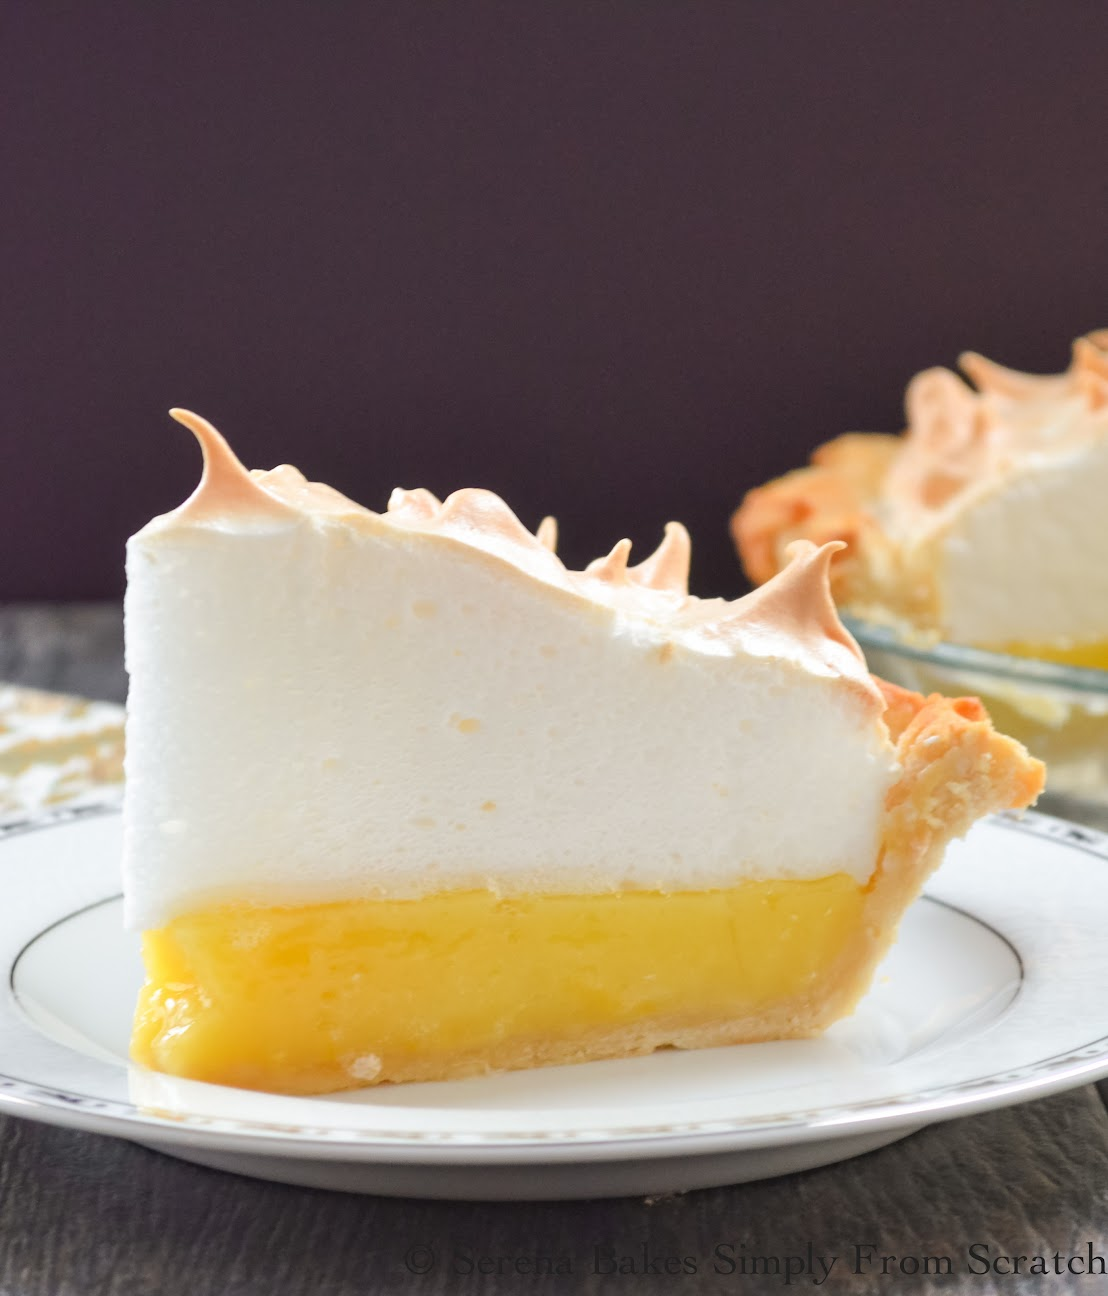 A gorgeous weep free Lemon Meringue Pie for #SundaySupper